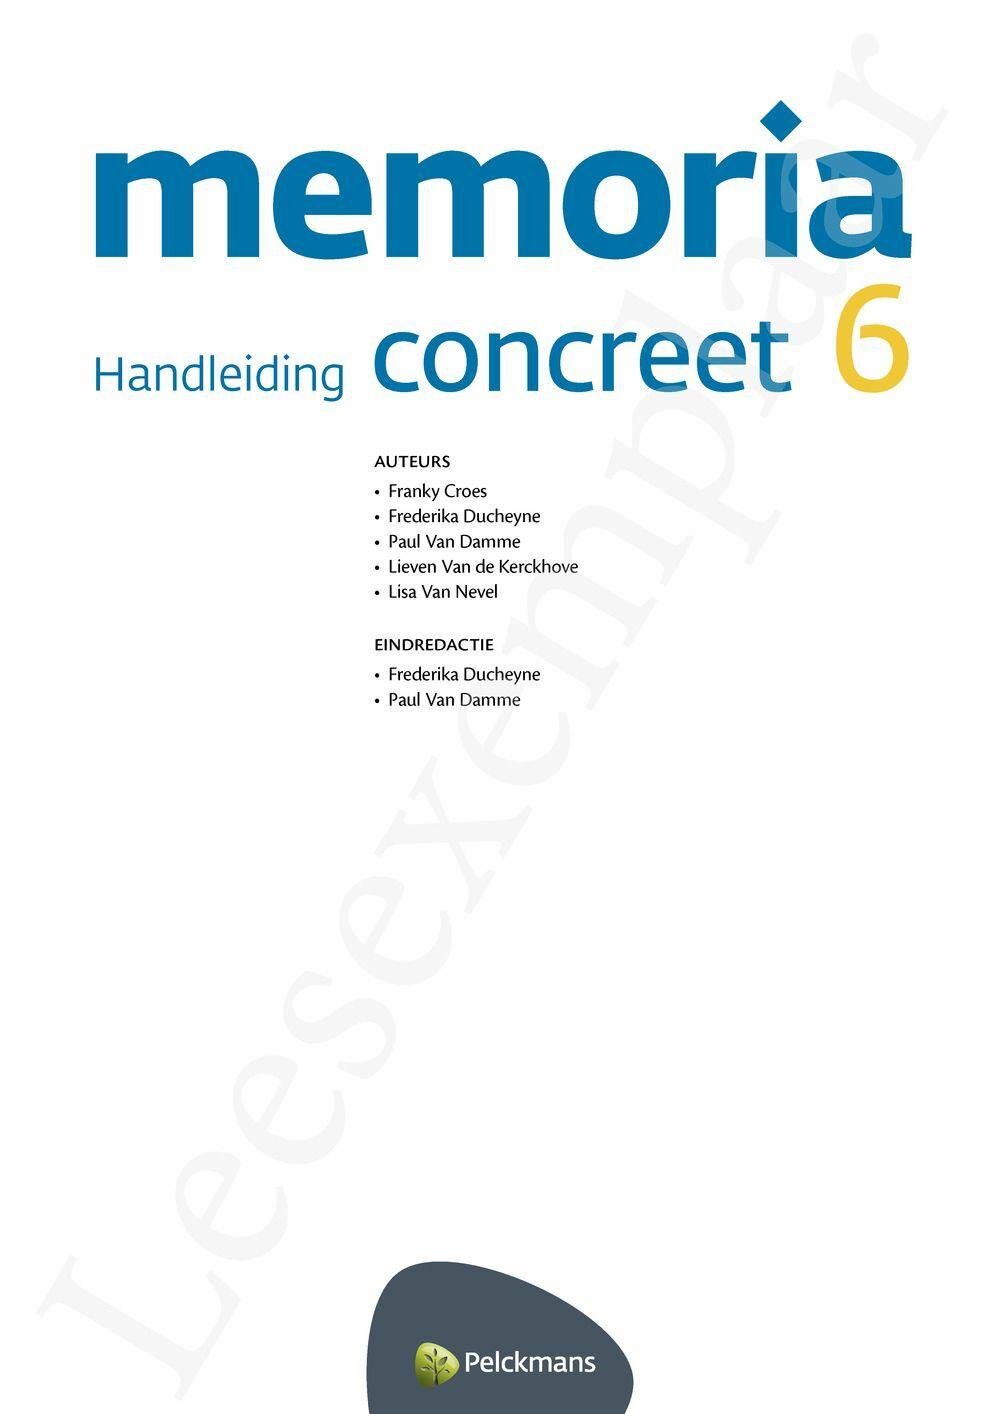 Preview: Memoria concreet 6 handleiding